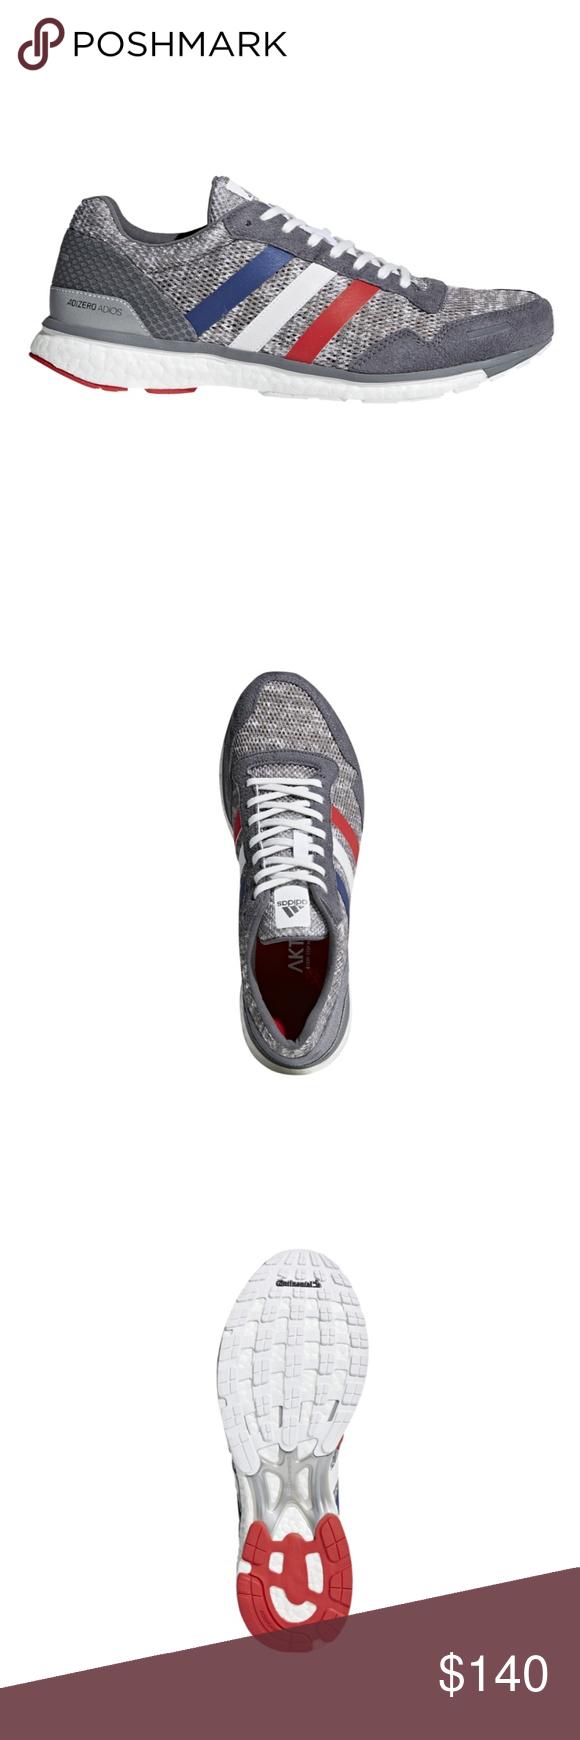 Percepción Dar a luz Encommium  New Mens Adidas Running Shoes Size 7.5 No Box Adidas Adizero Adios BOOST 3  AKTIV Running Shoes New without b… | Adidas running shoes, Running shoes,  Adidas running